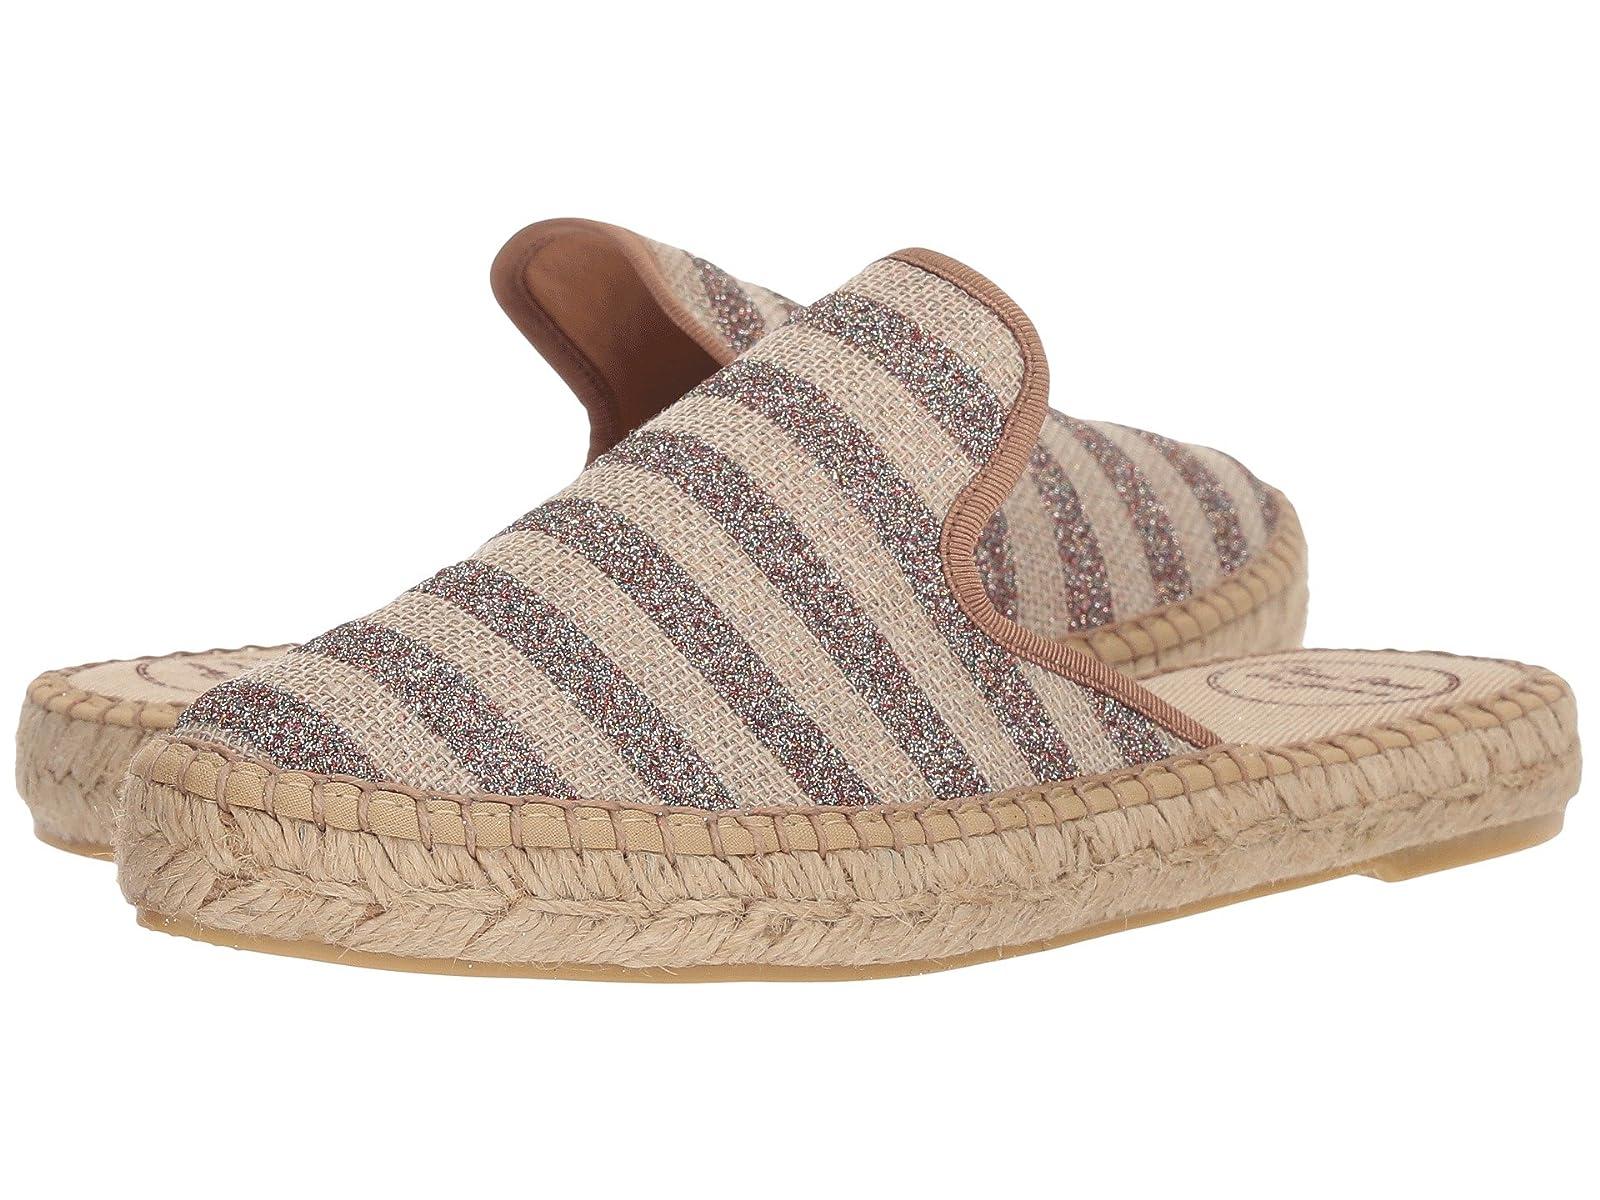 Toni Pons Ona-AVAtmospheric grades have affordable shoes